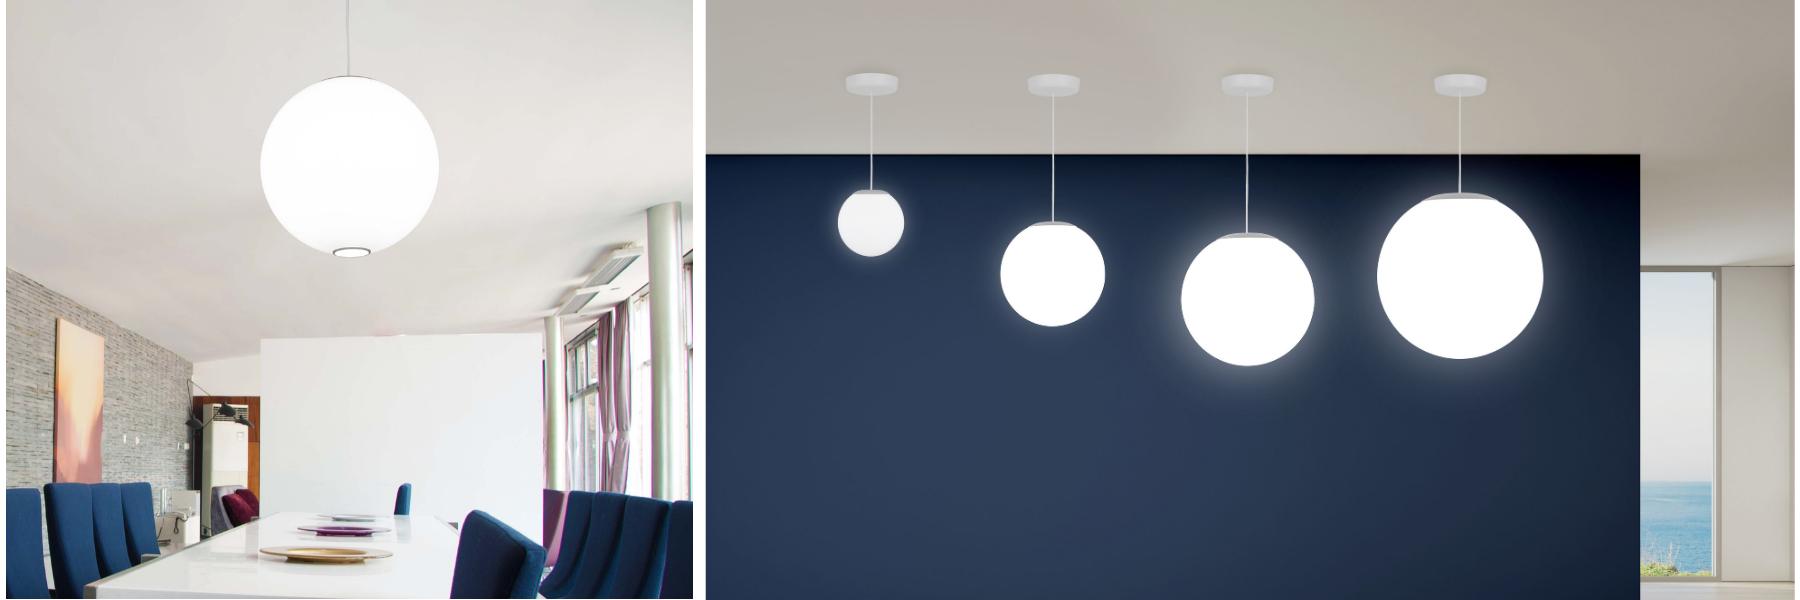 Zume indoor globe LED pendant lights by Visa Lighting